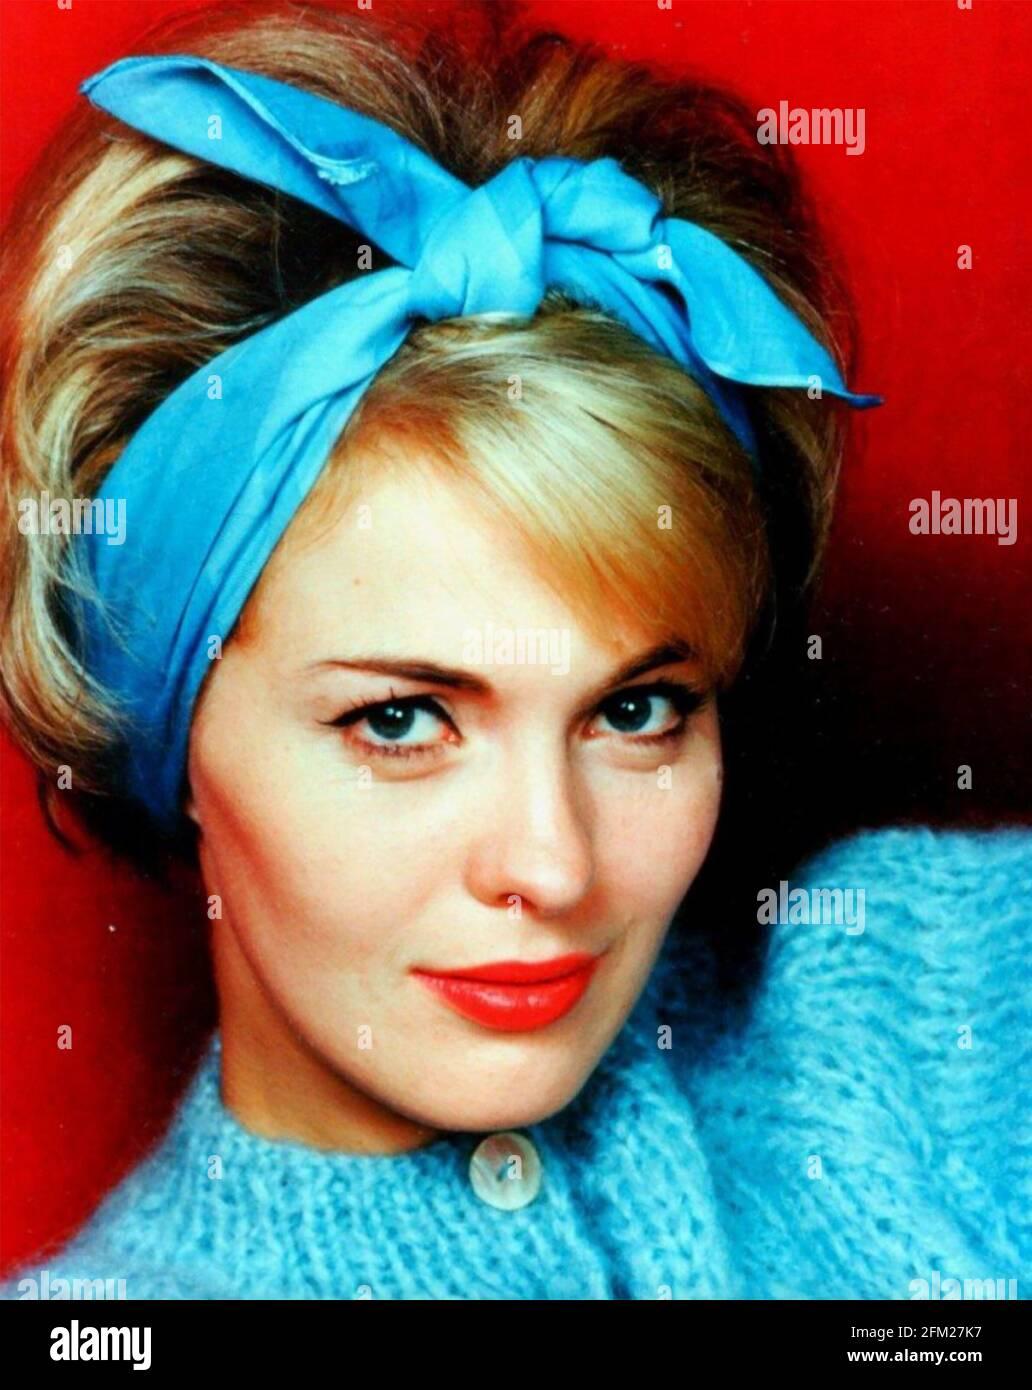 JEAN SEBBERG (1938-1979) actriz cinematográfica estadounidense cerca de 1965 Foto de stock